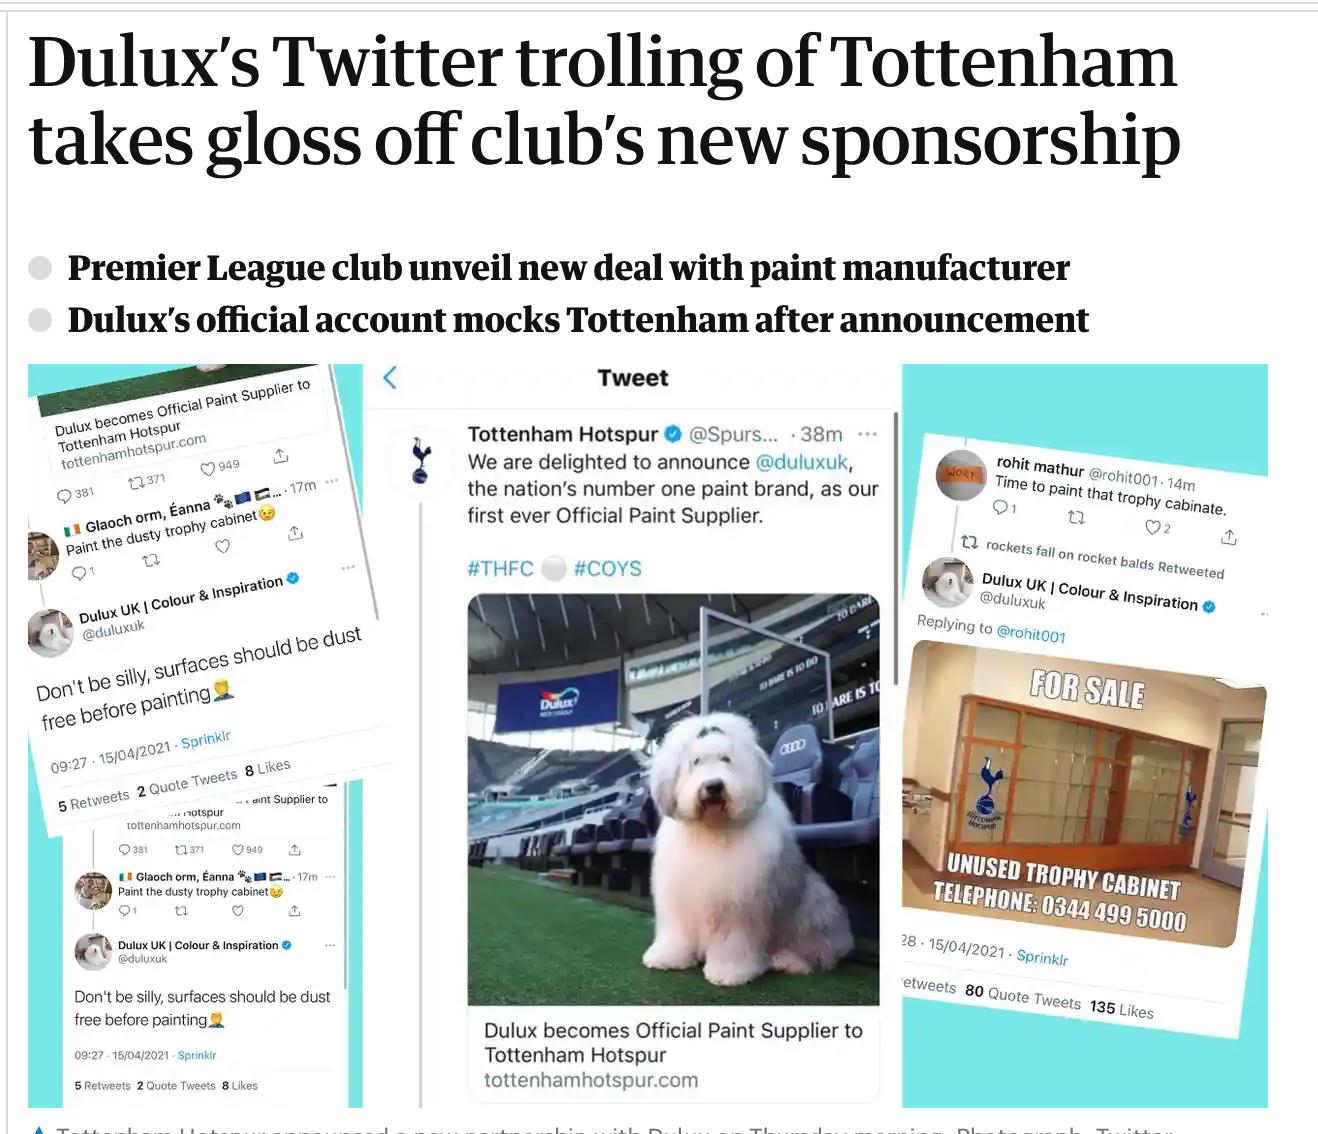 Dulux's social media blunder about Tottenham Hotspur